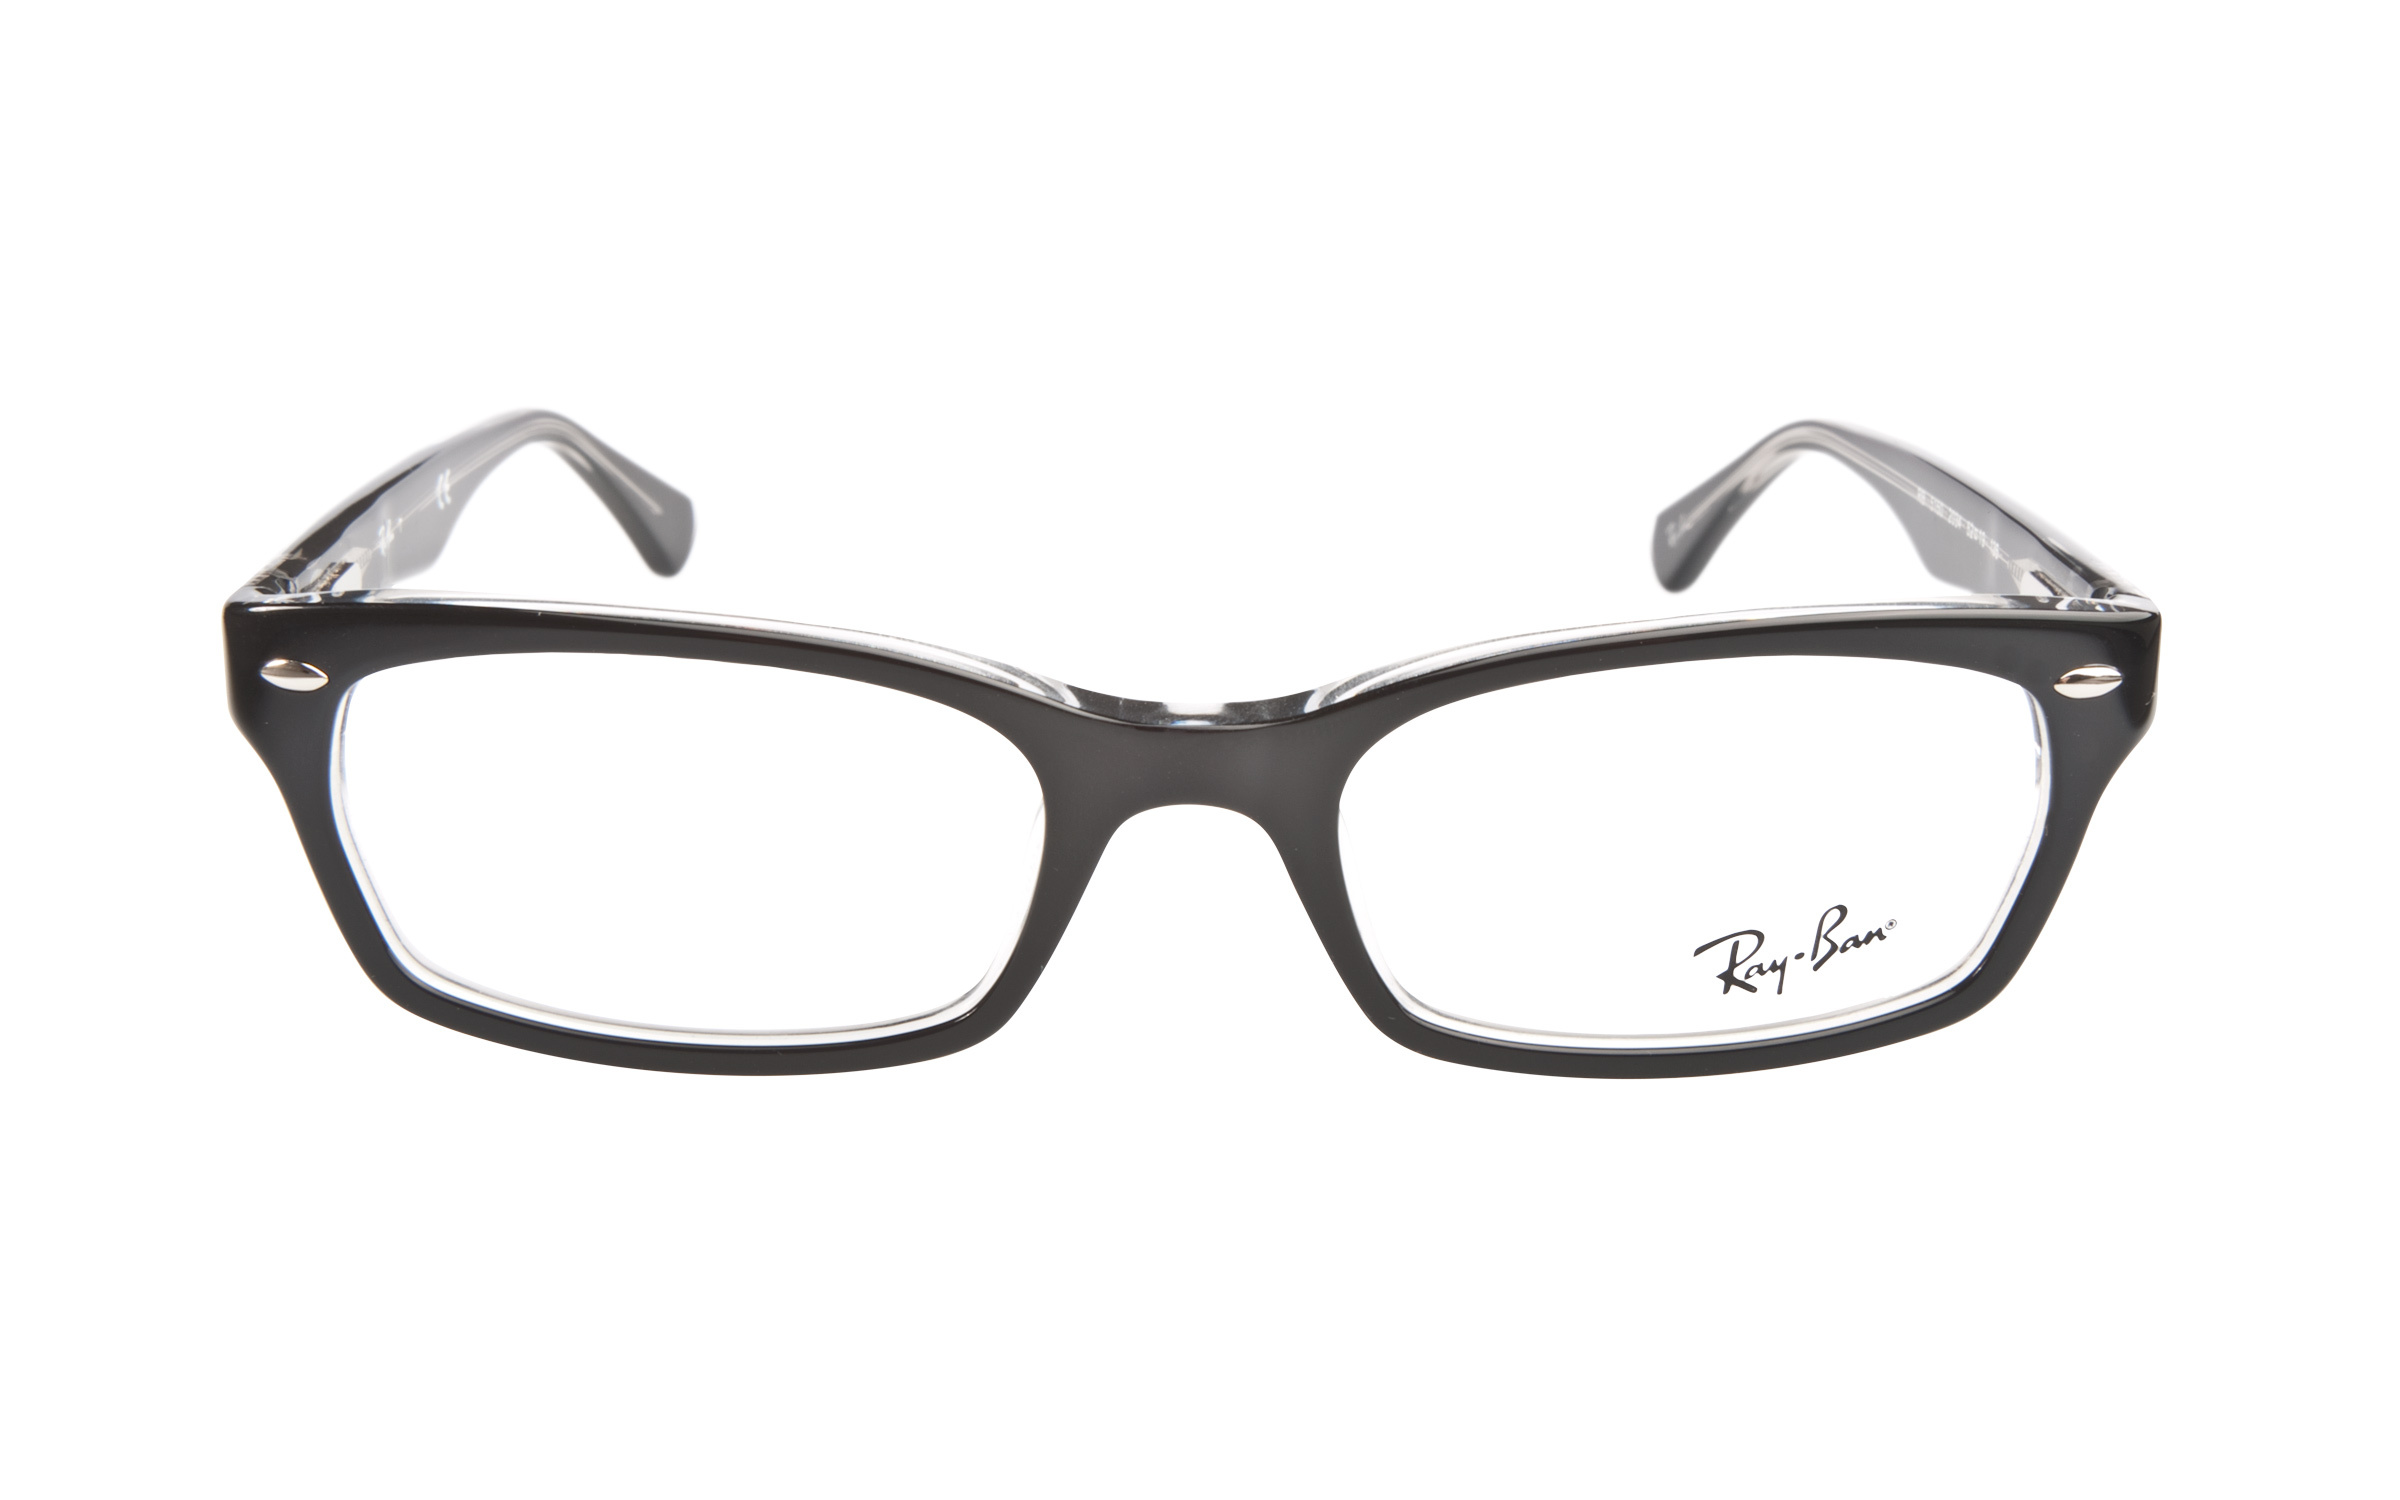 Ray-Ban Glasses Classic Black Acetate Online Coastal